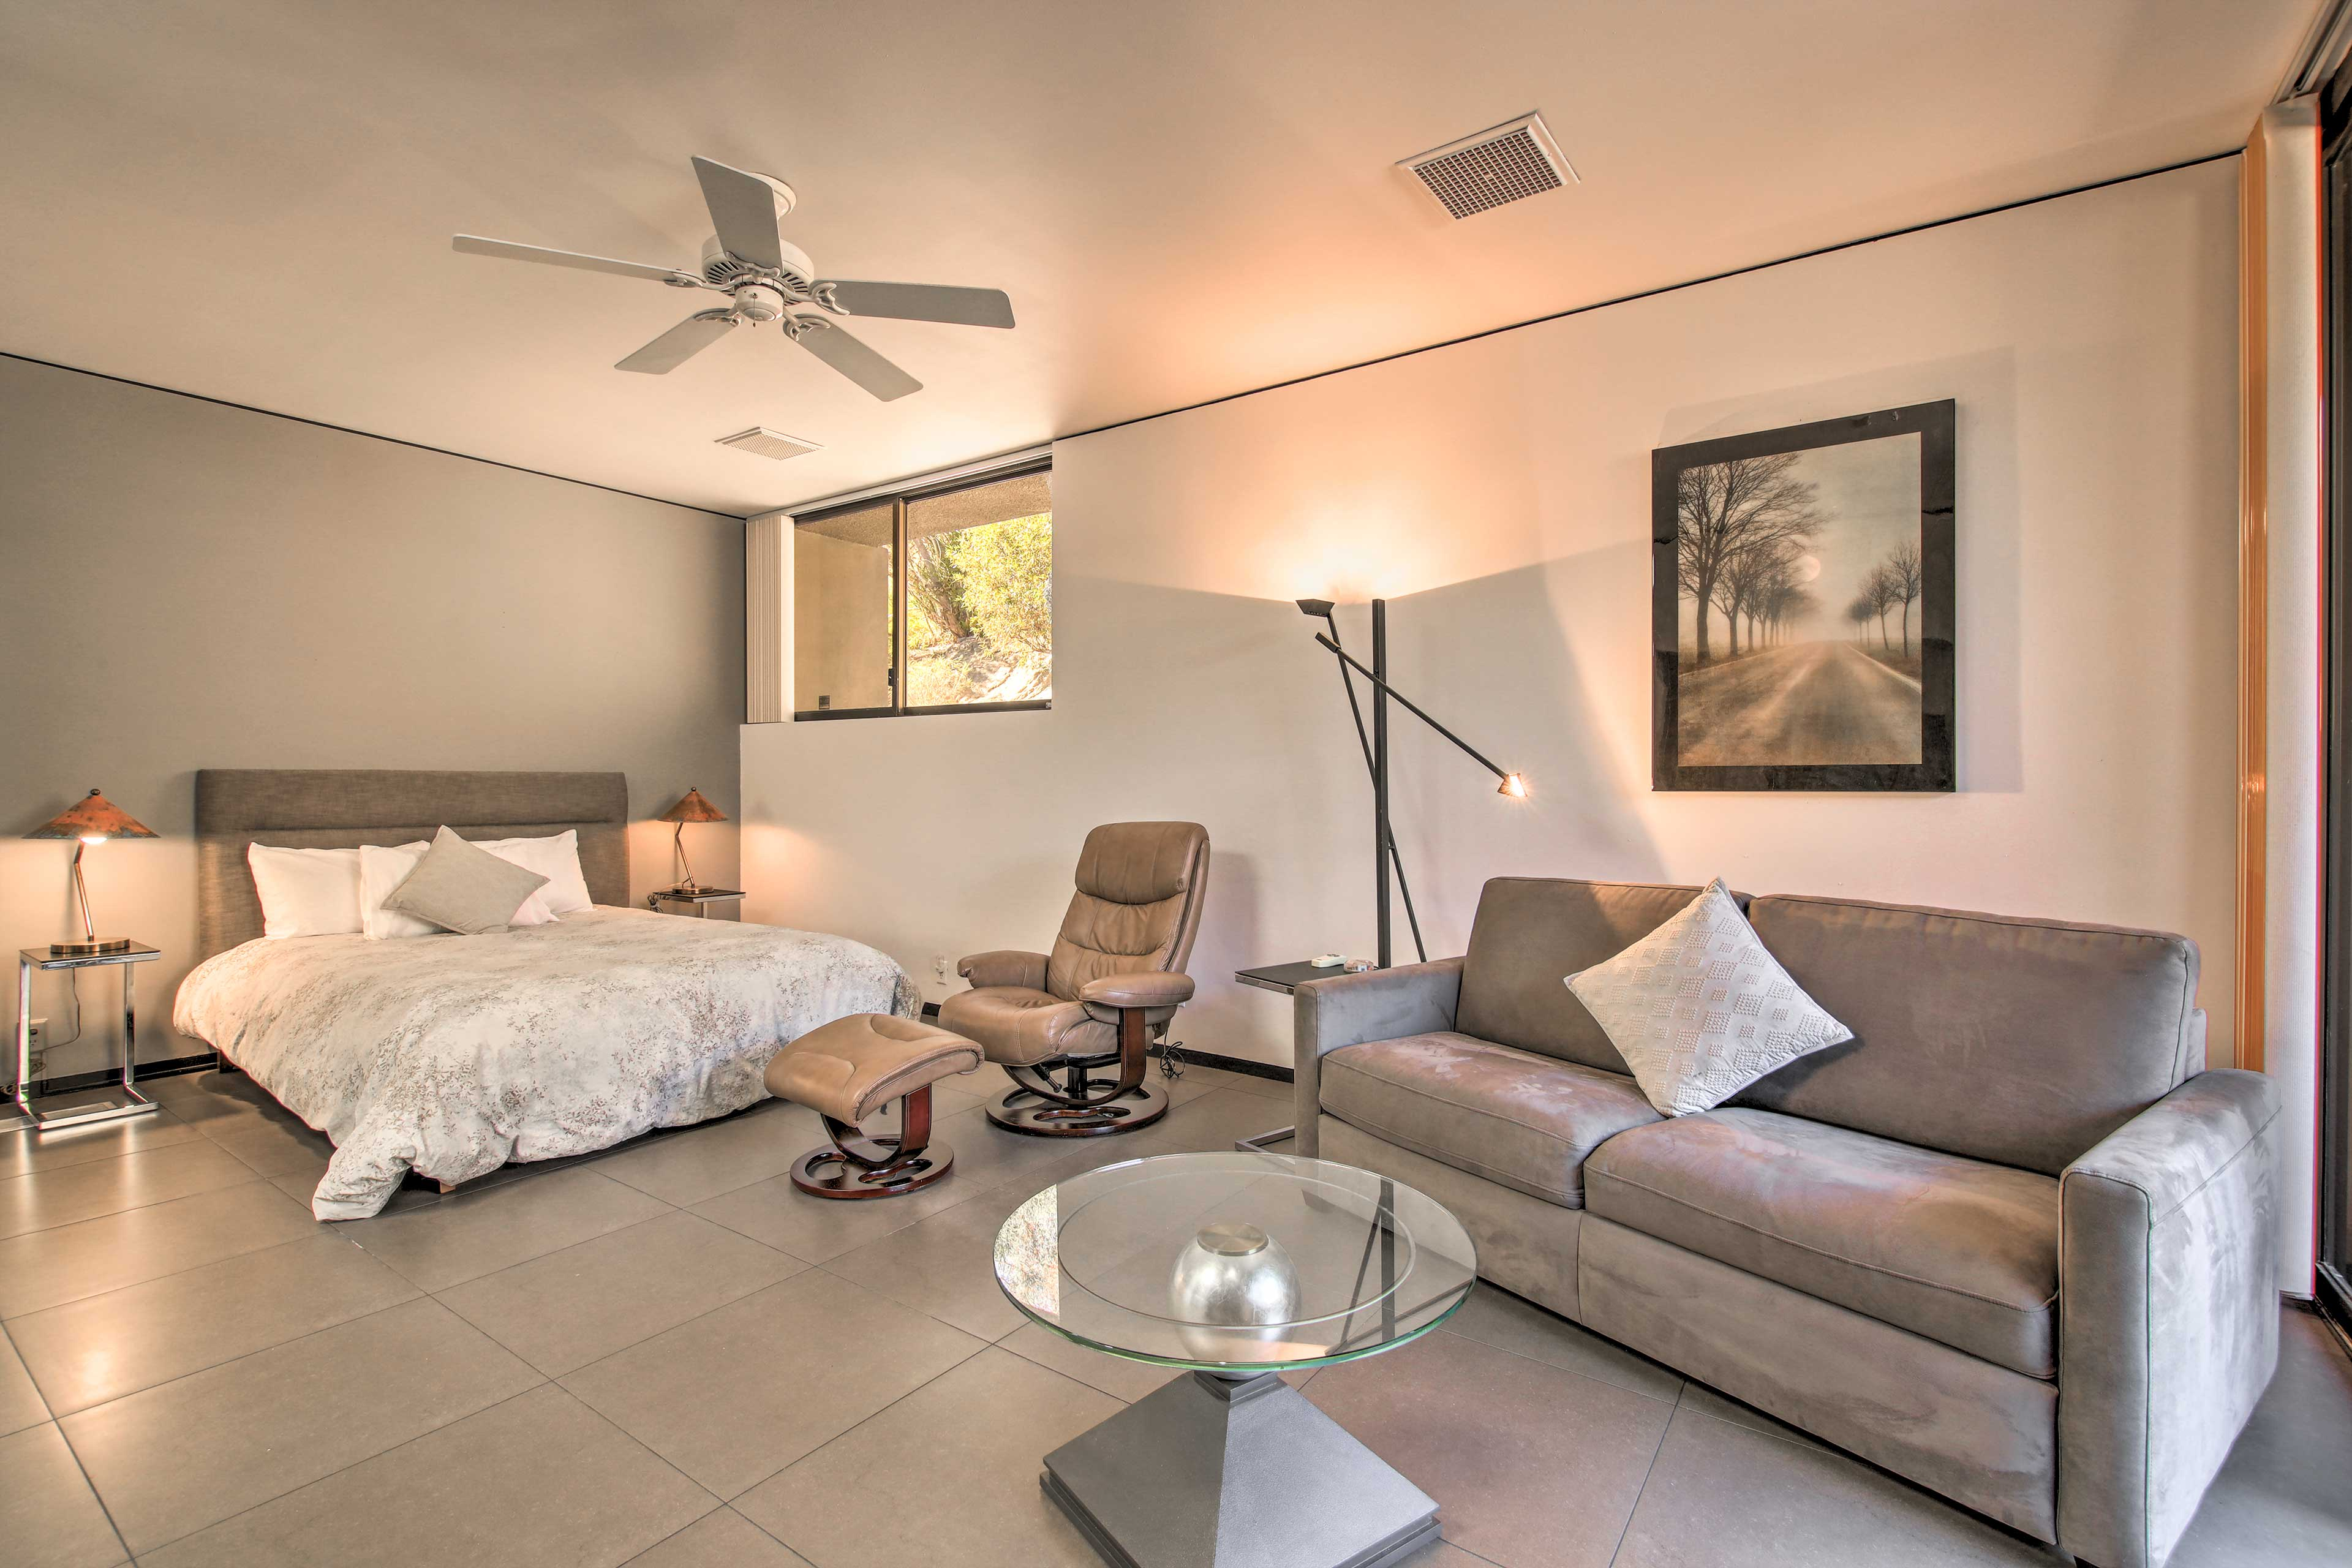 Bedroom 2 | Queen Bed | Cable TV | Patio Access